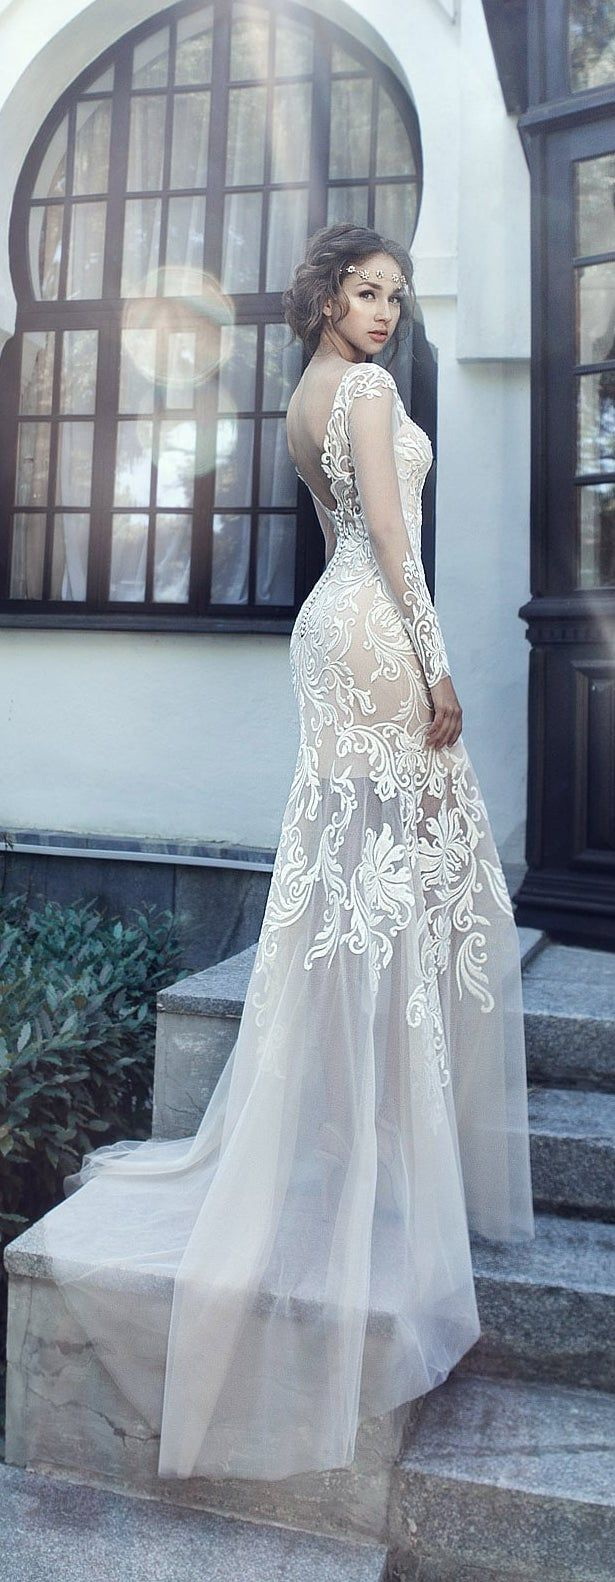 10459 best 2015 wedding dresses images on Pinterest | Weddings ...